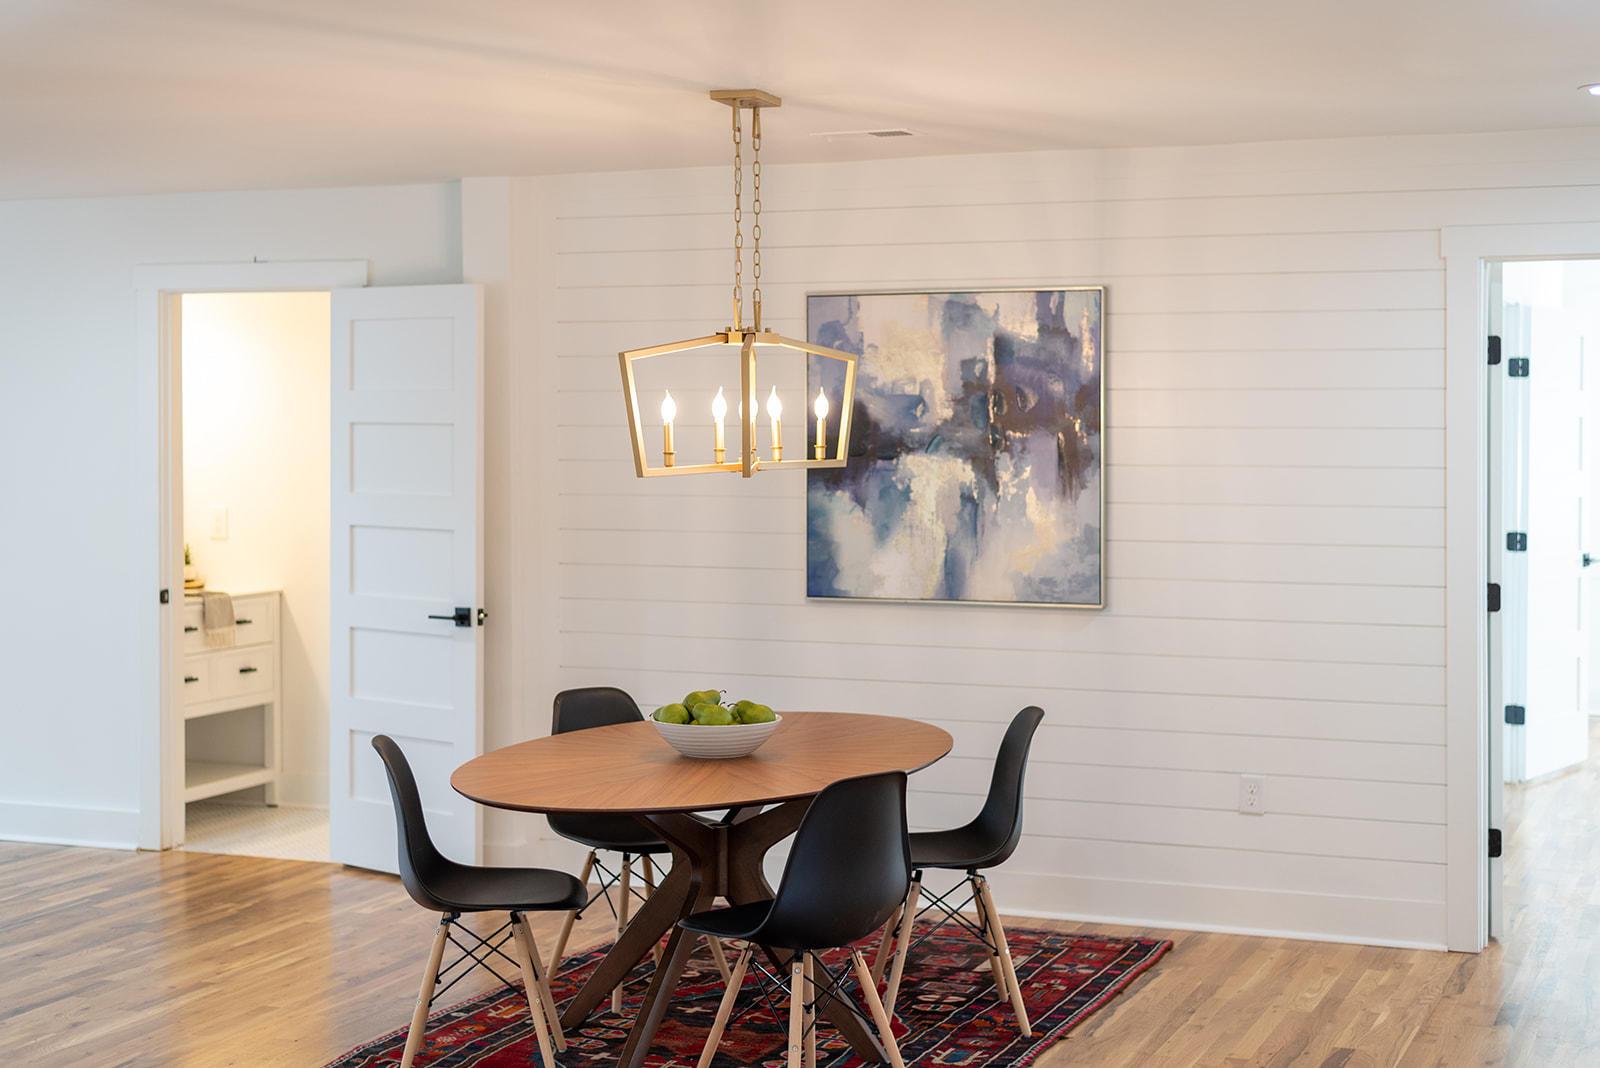 Bay View Acres Homes For Sale - 265 Coleman, Mount Pleasant, SC - 30